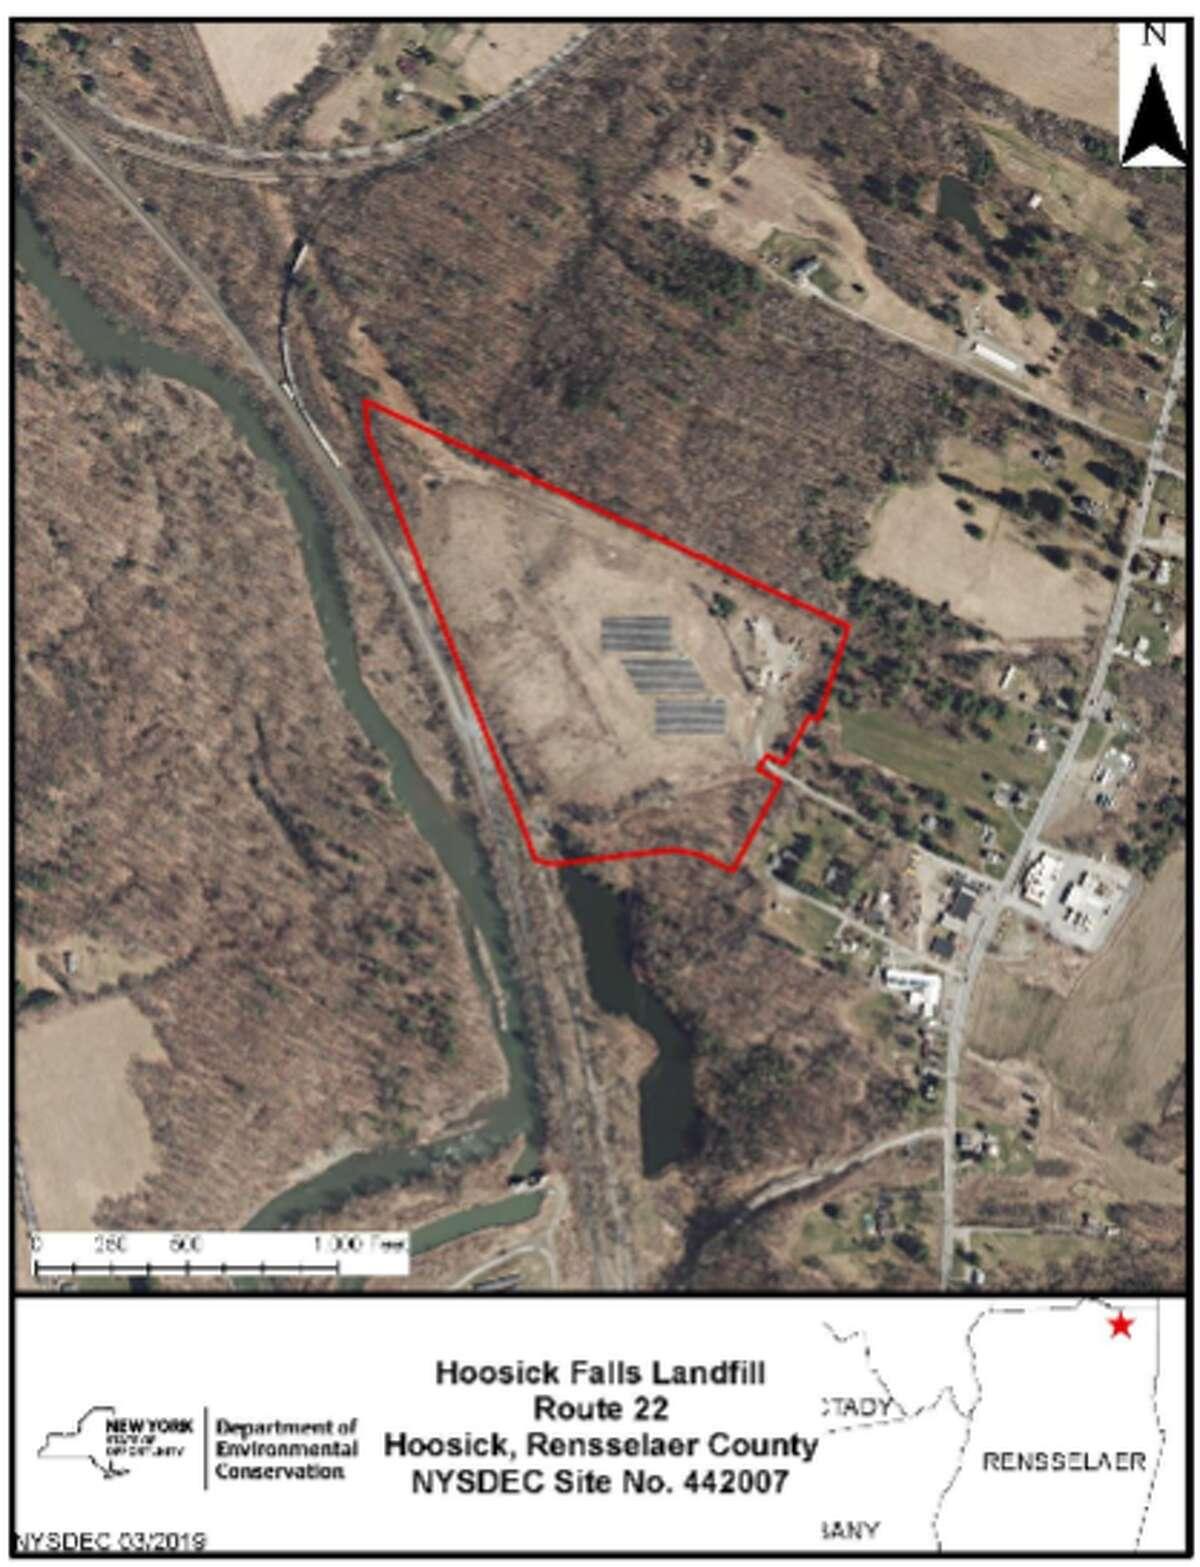 Site of Hoosick Falls Landfill